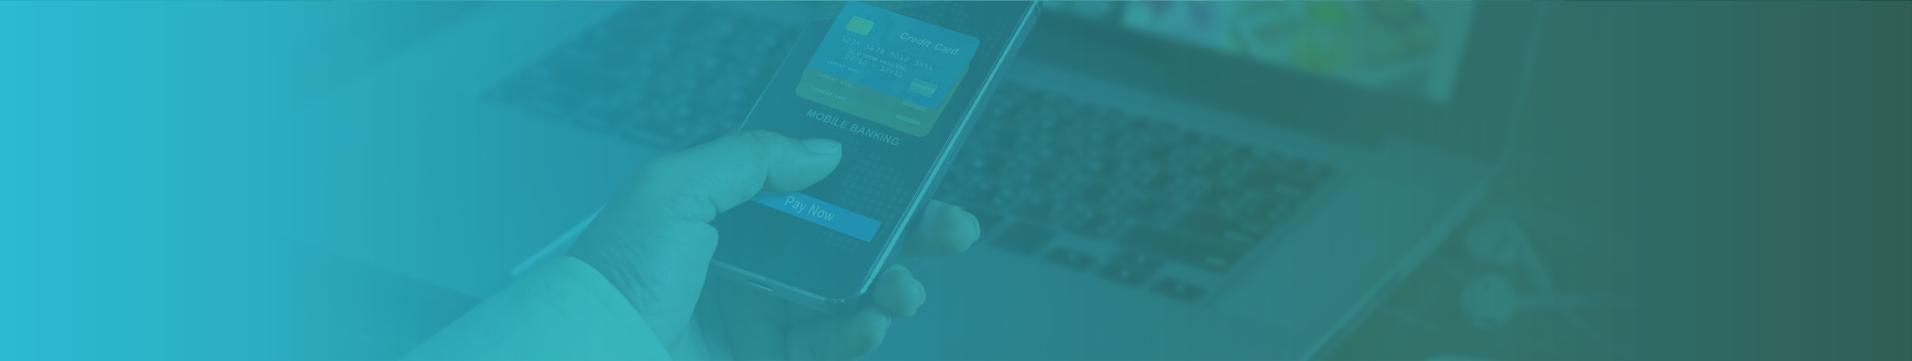 Digital customer engagement